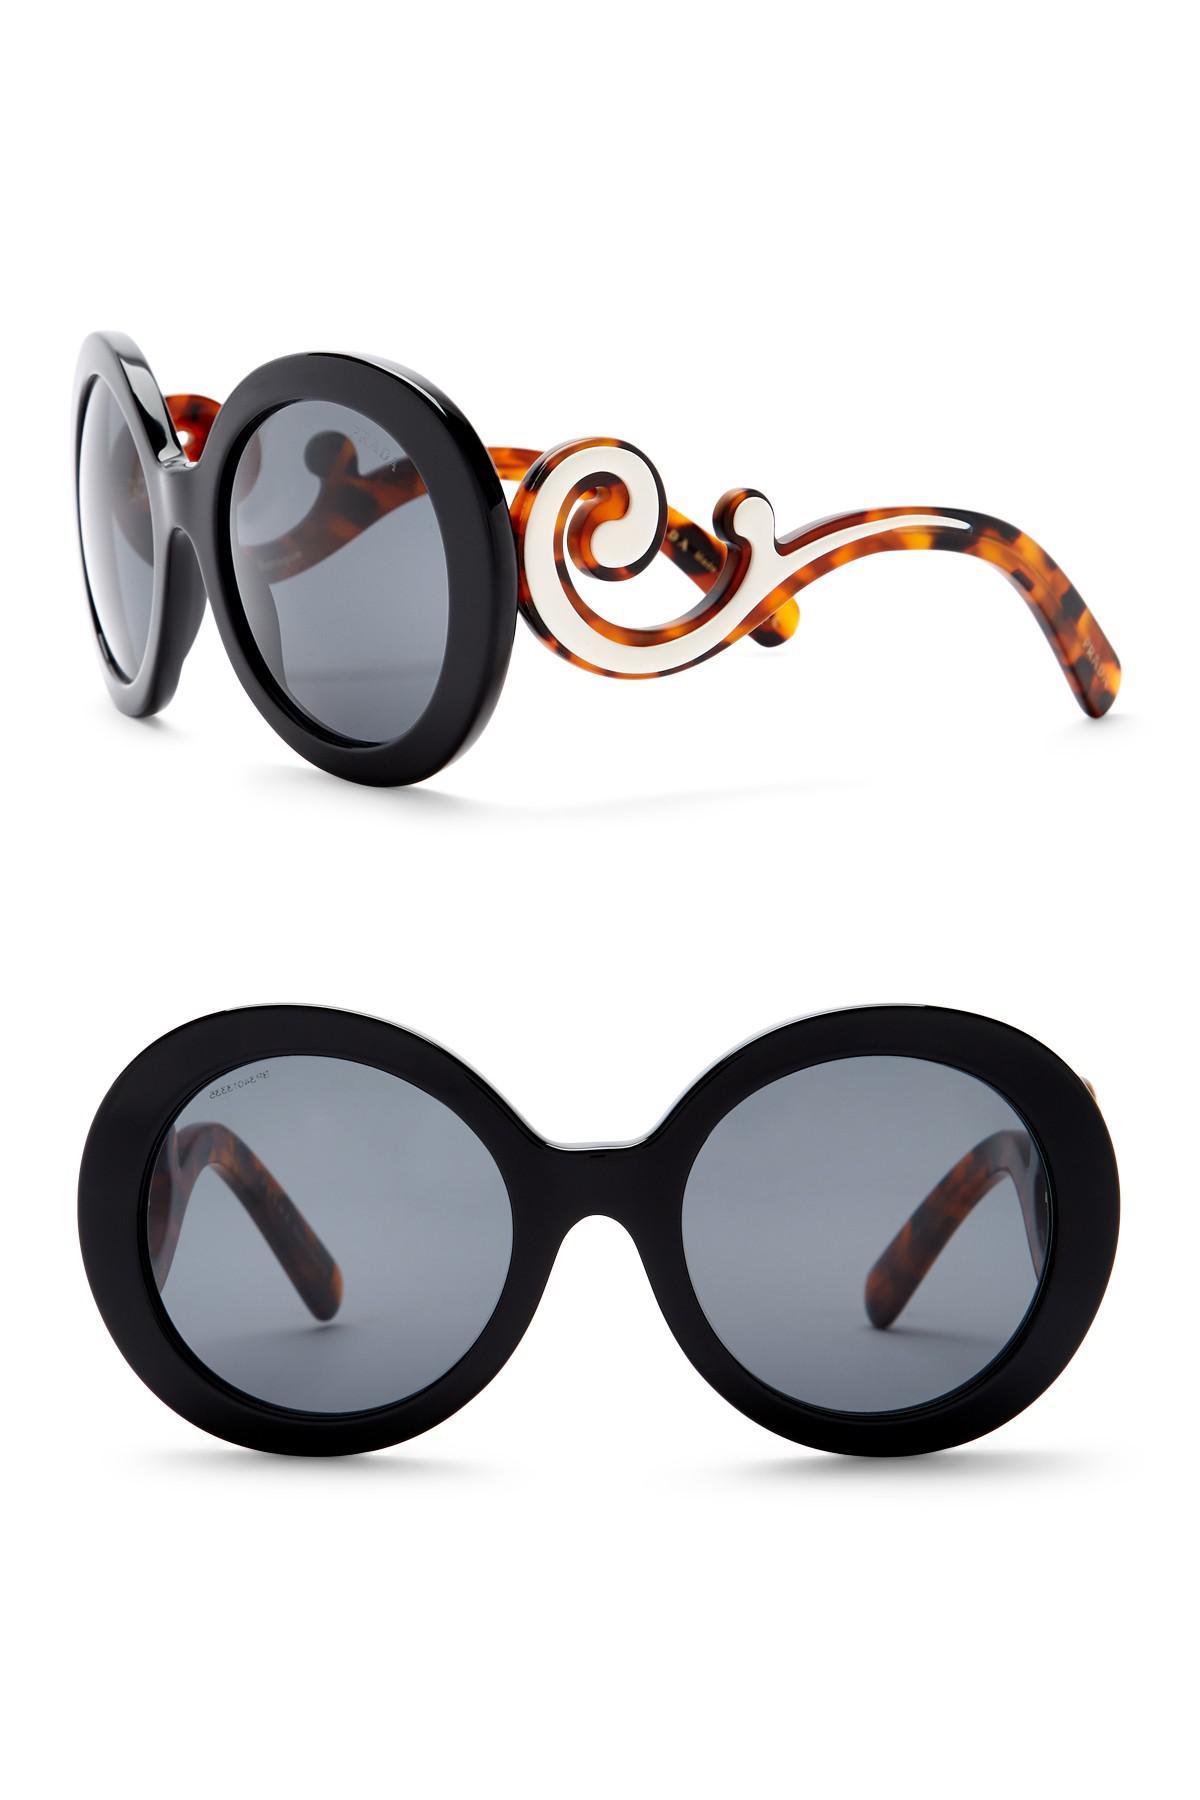 a45989571df0a Prada Round Catwalk Sunglasses Women s 55mm Minimal Lyst Baroque BdqfB